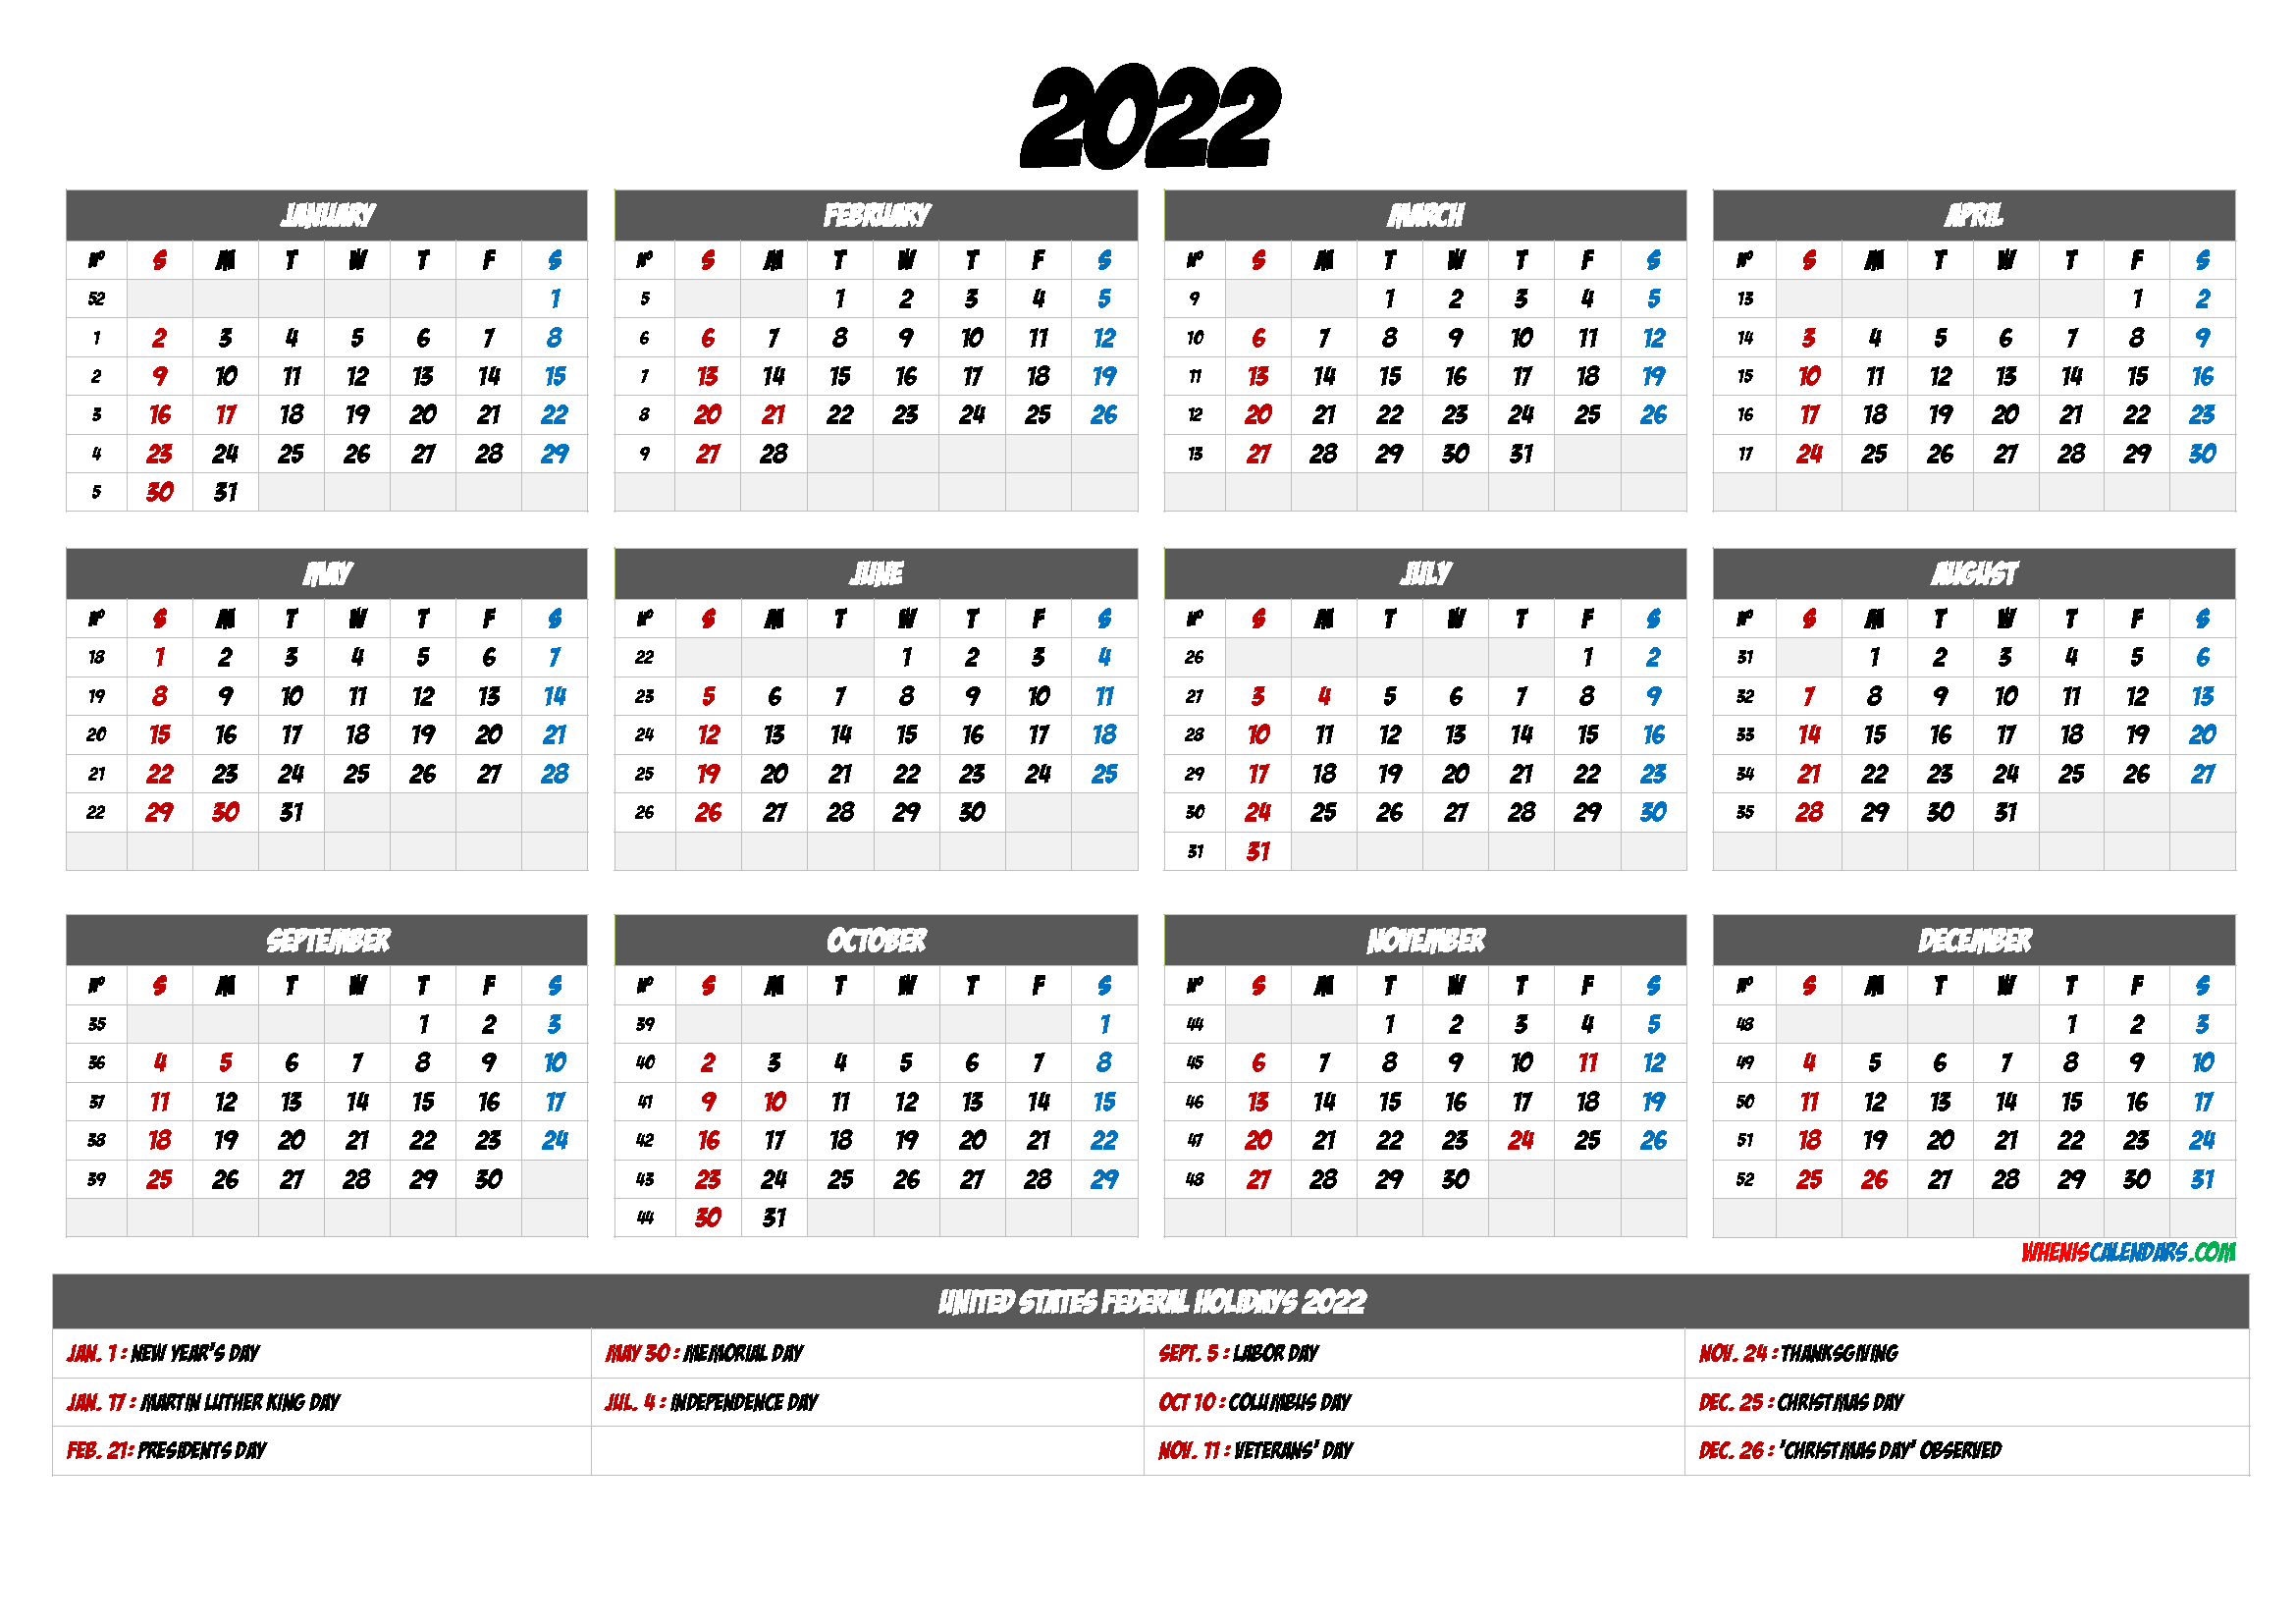 Free Printable 2022 Calendar With Holidays - 9 Templates